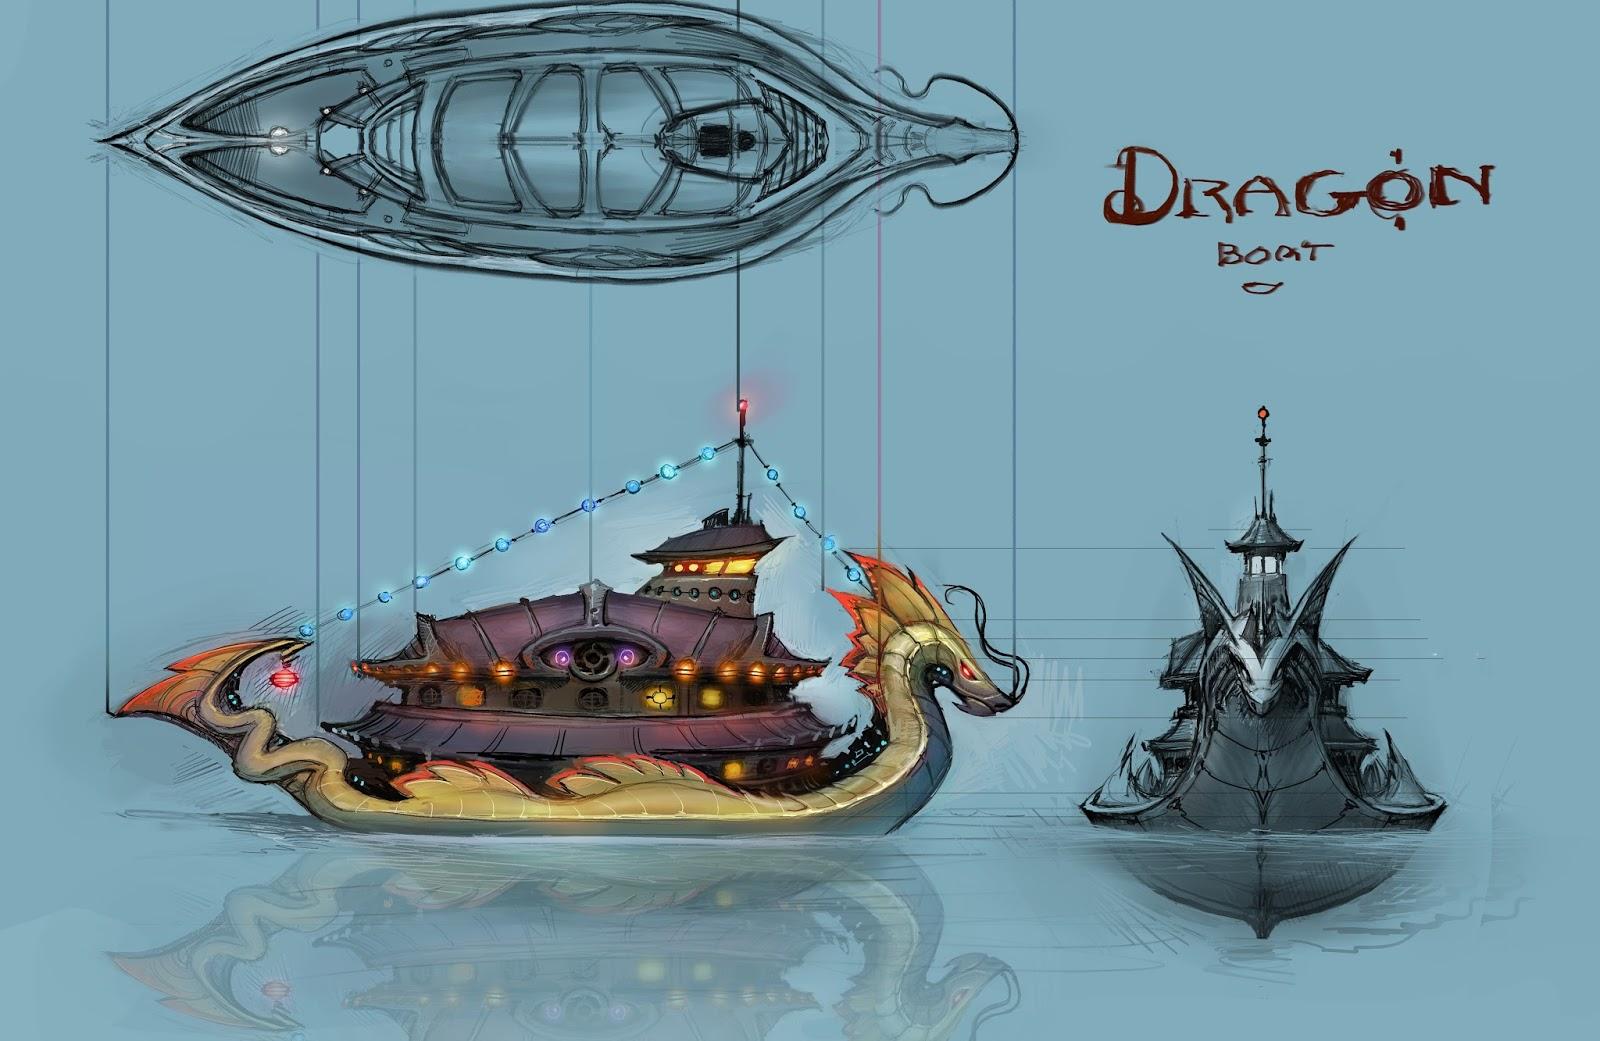 [Civils] Guardians of the Sea Dragon+boat8